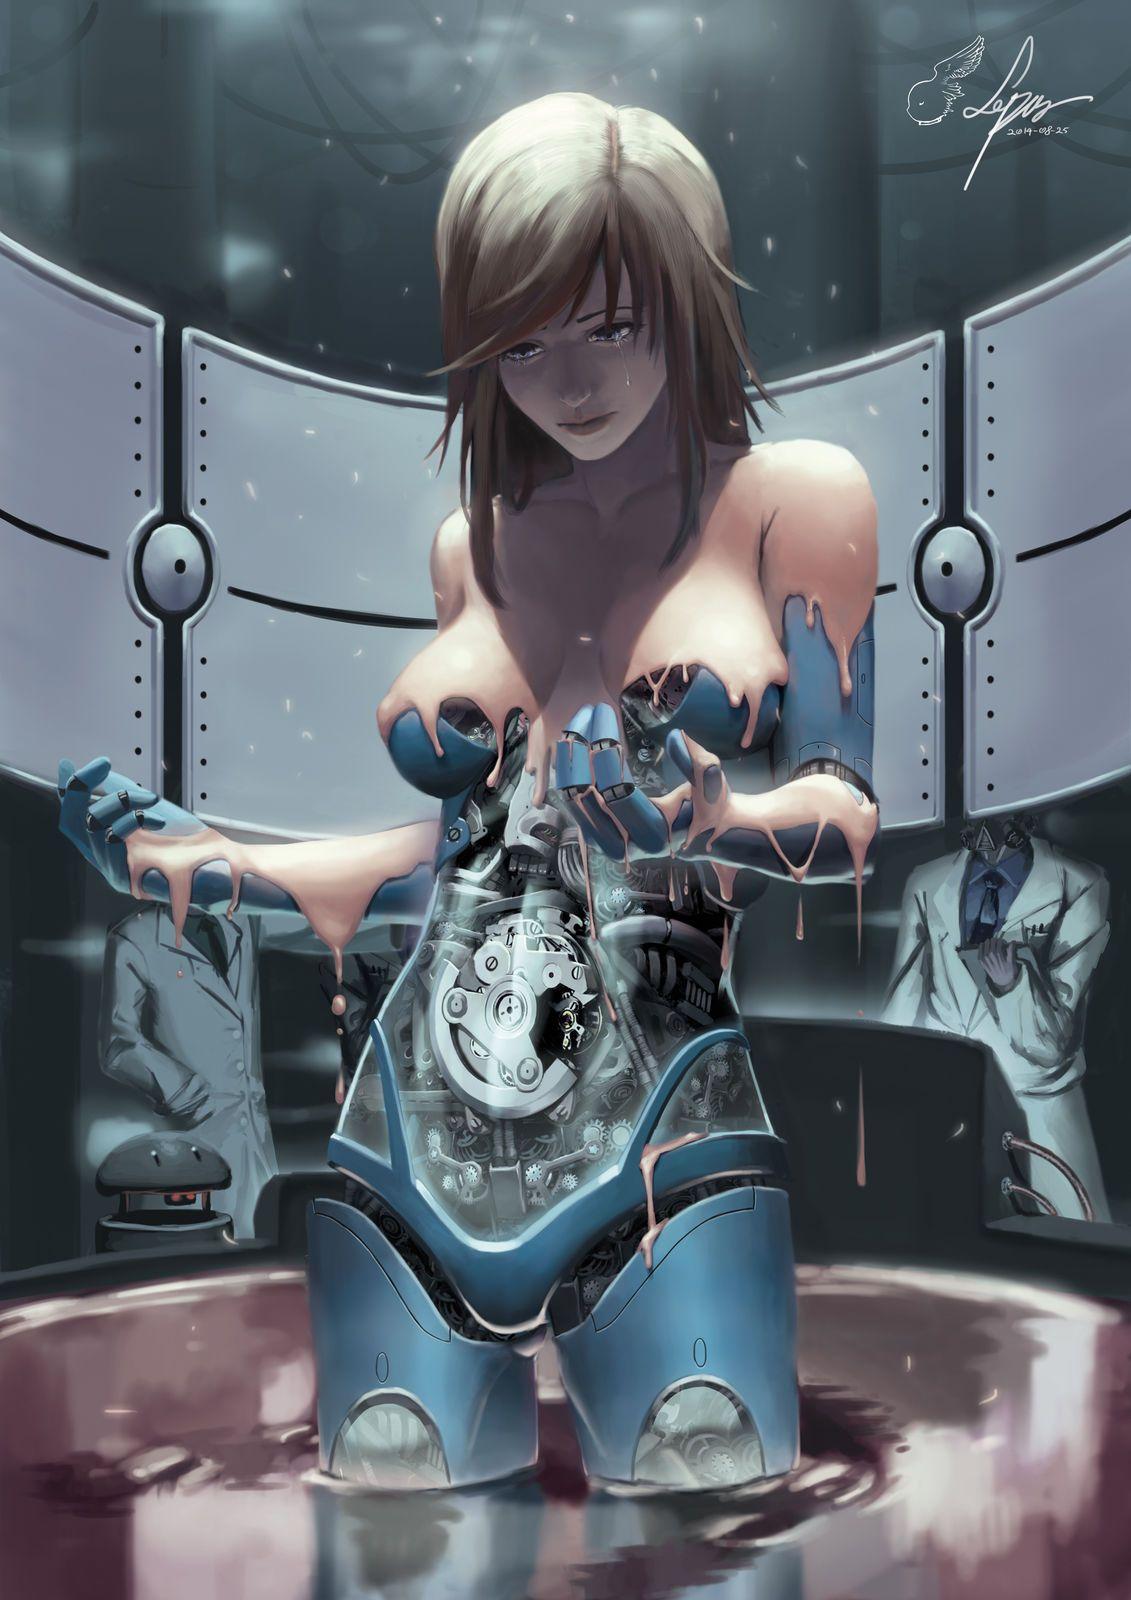 cyberpunk #future #graphics | The HUB | Pinterest | Sci fi ...